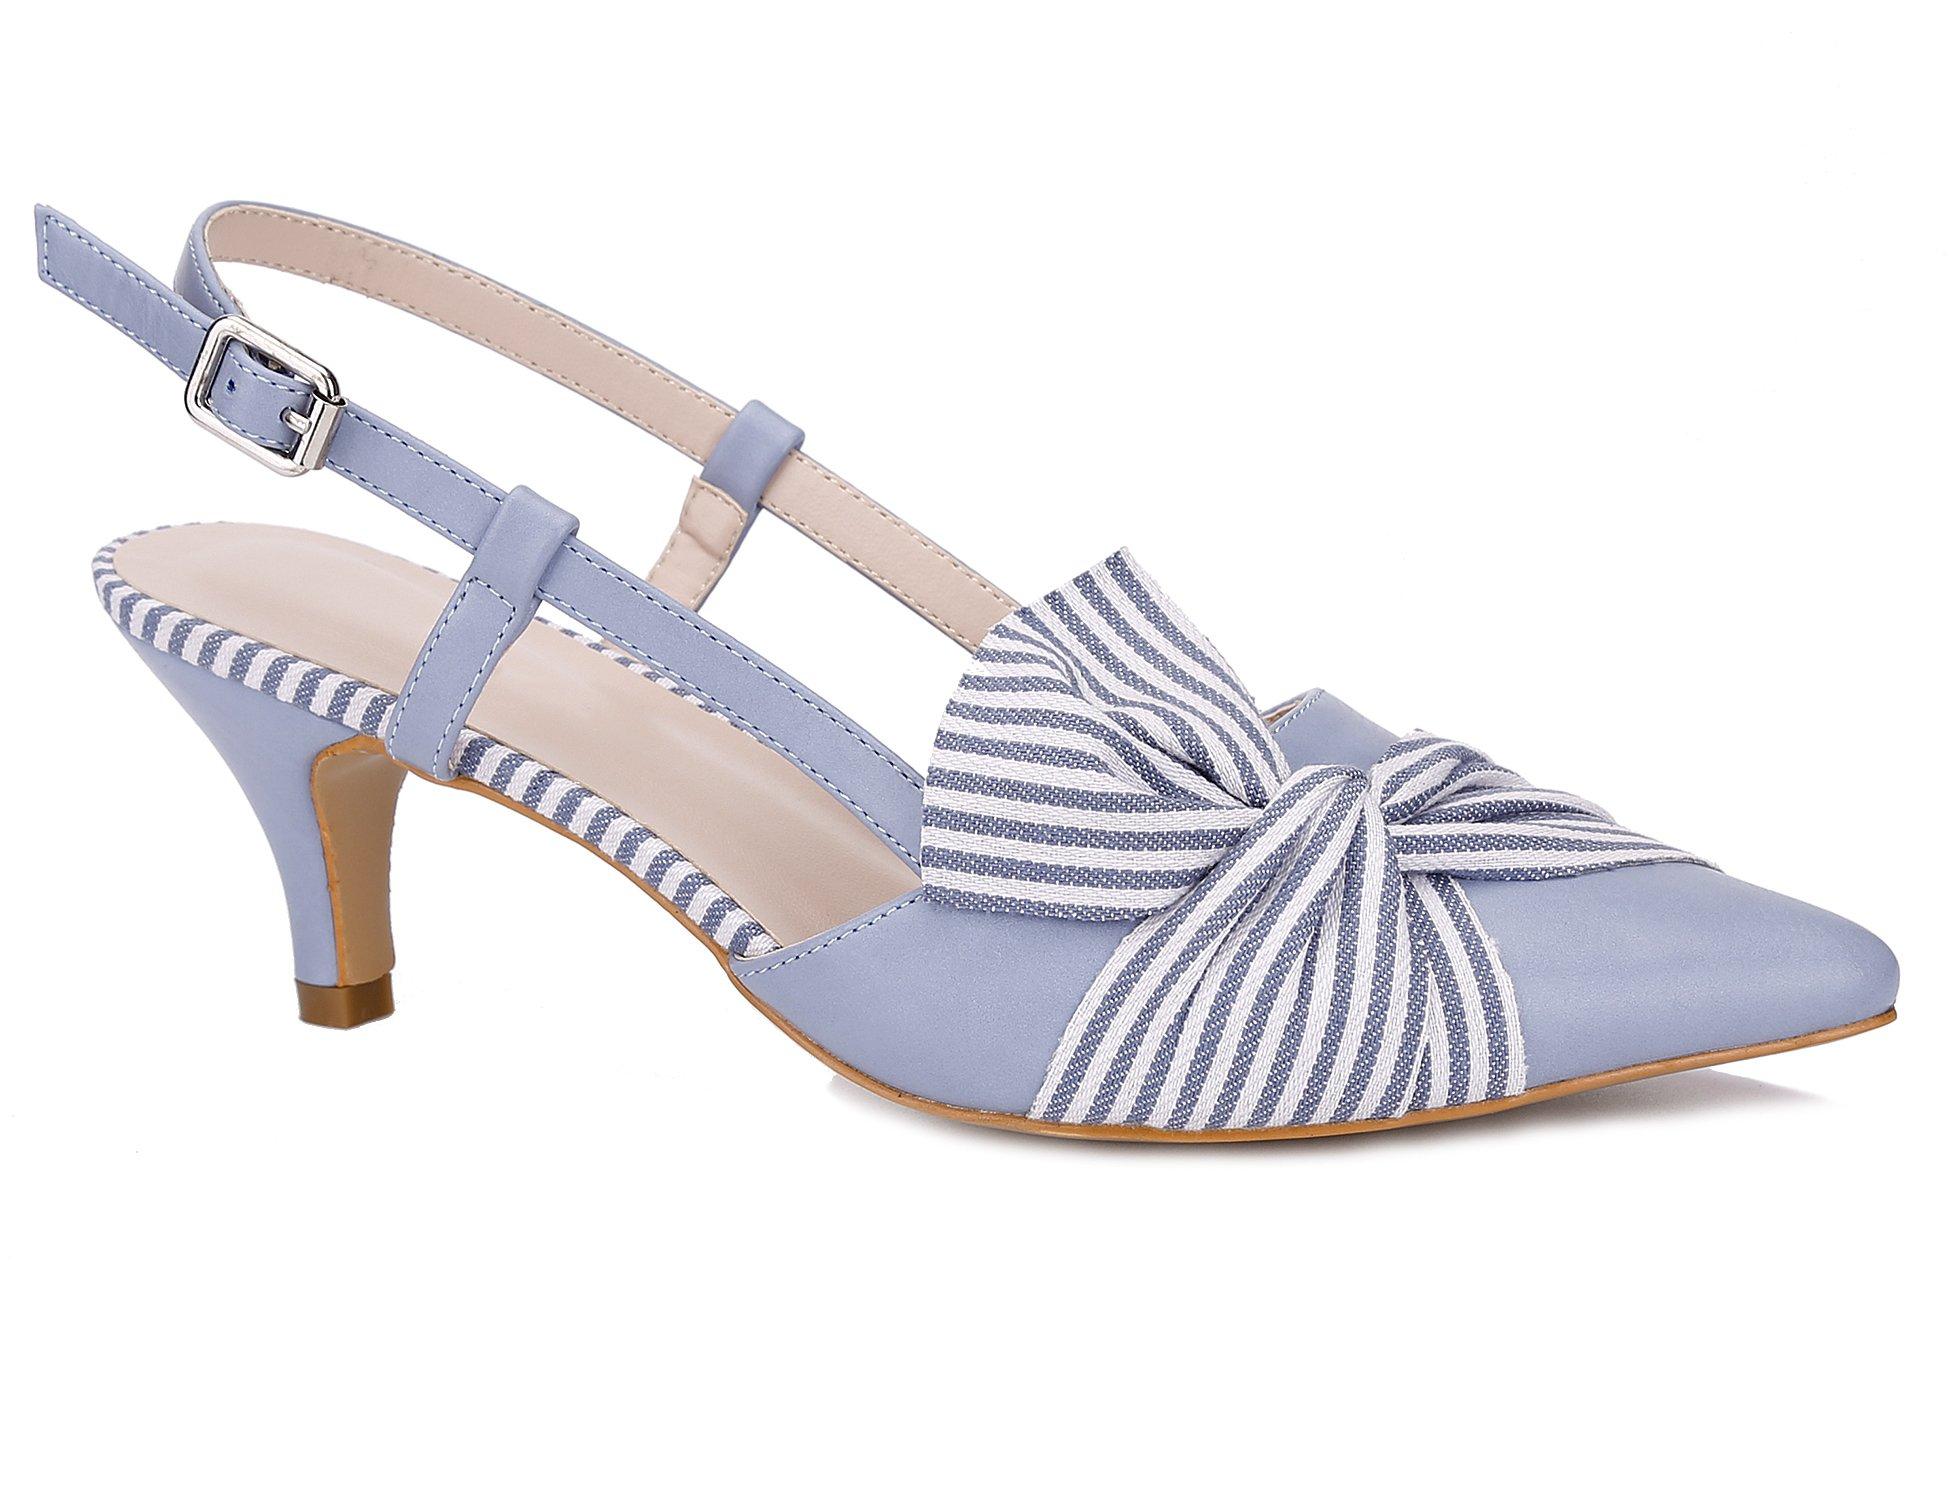 Greatonu Women Shoes Comfortable Kitten Heels Slingback Dress Pumps (9 US/40 EU, Light Blue with Stripe Bow Tie)